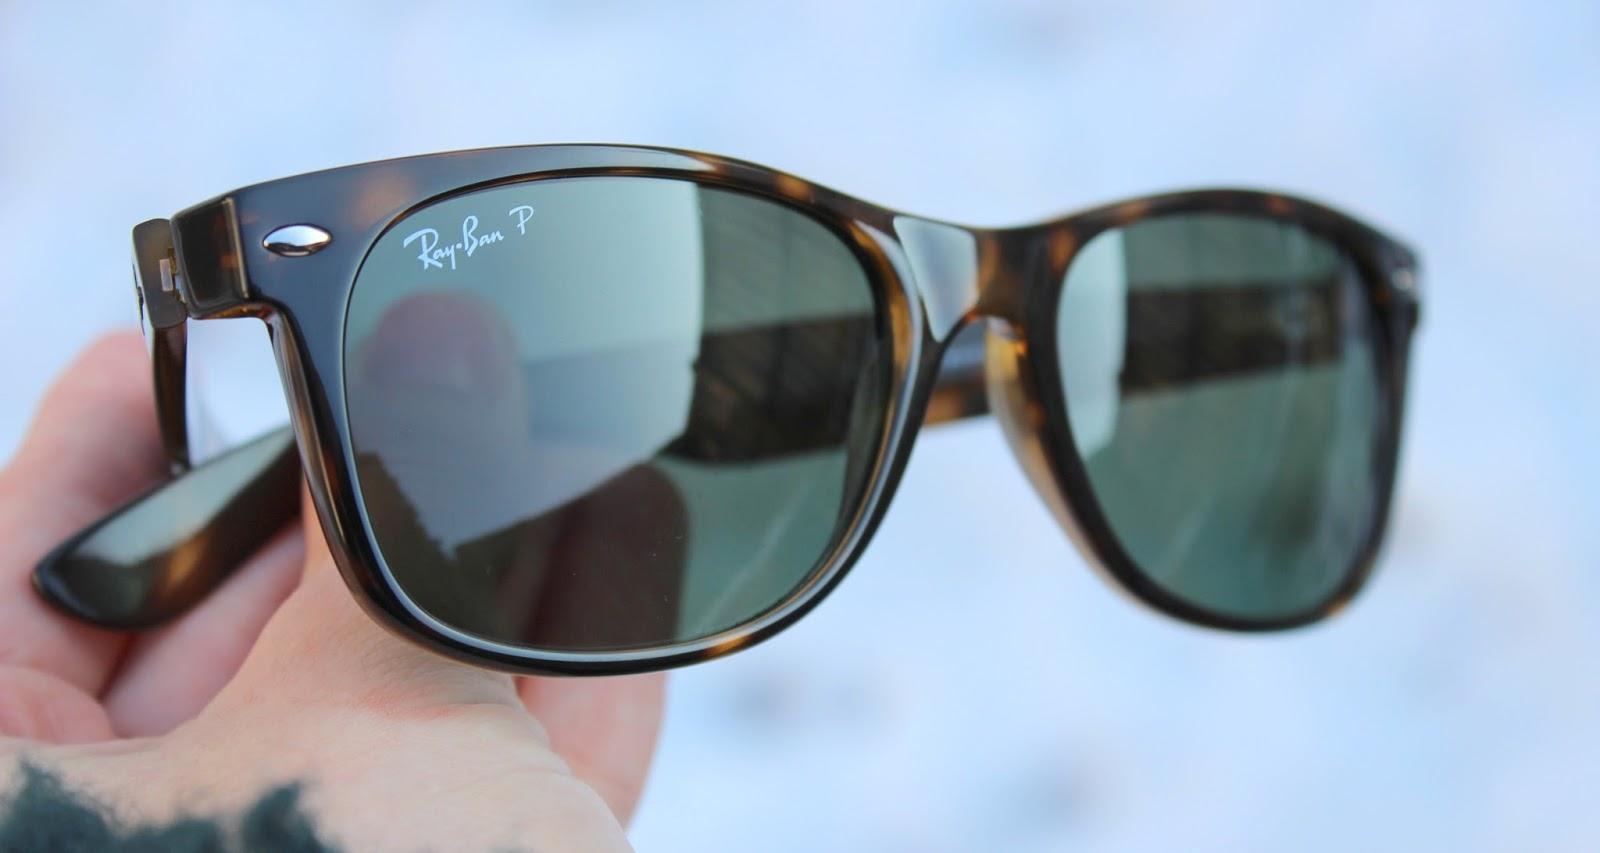 Ray ban new wayfarer sunglasses reviews